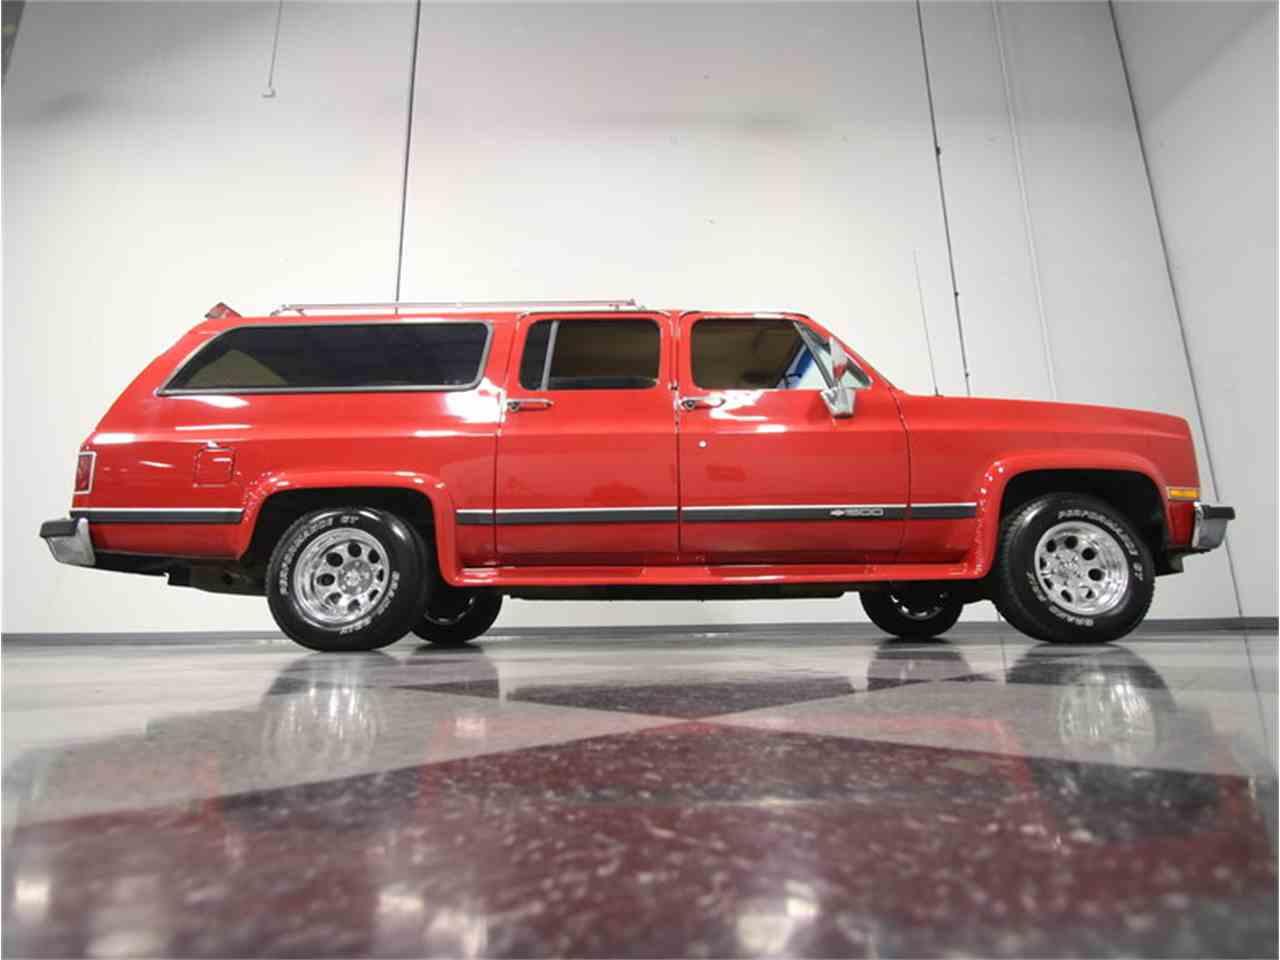 Large Picture of 1985 Chevrolet Suburban - $11,995.00 Offered by Streetside Classics - Atlanta - KIU1